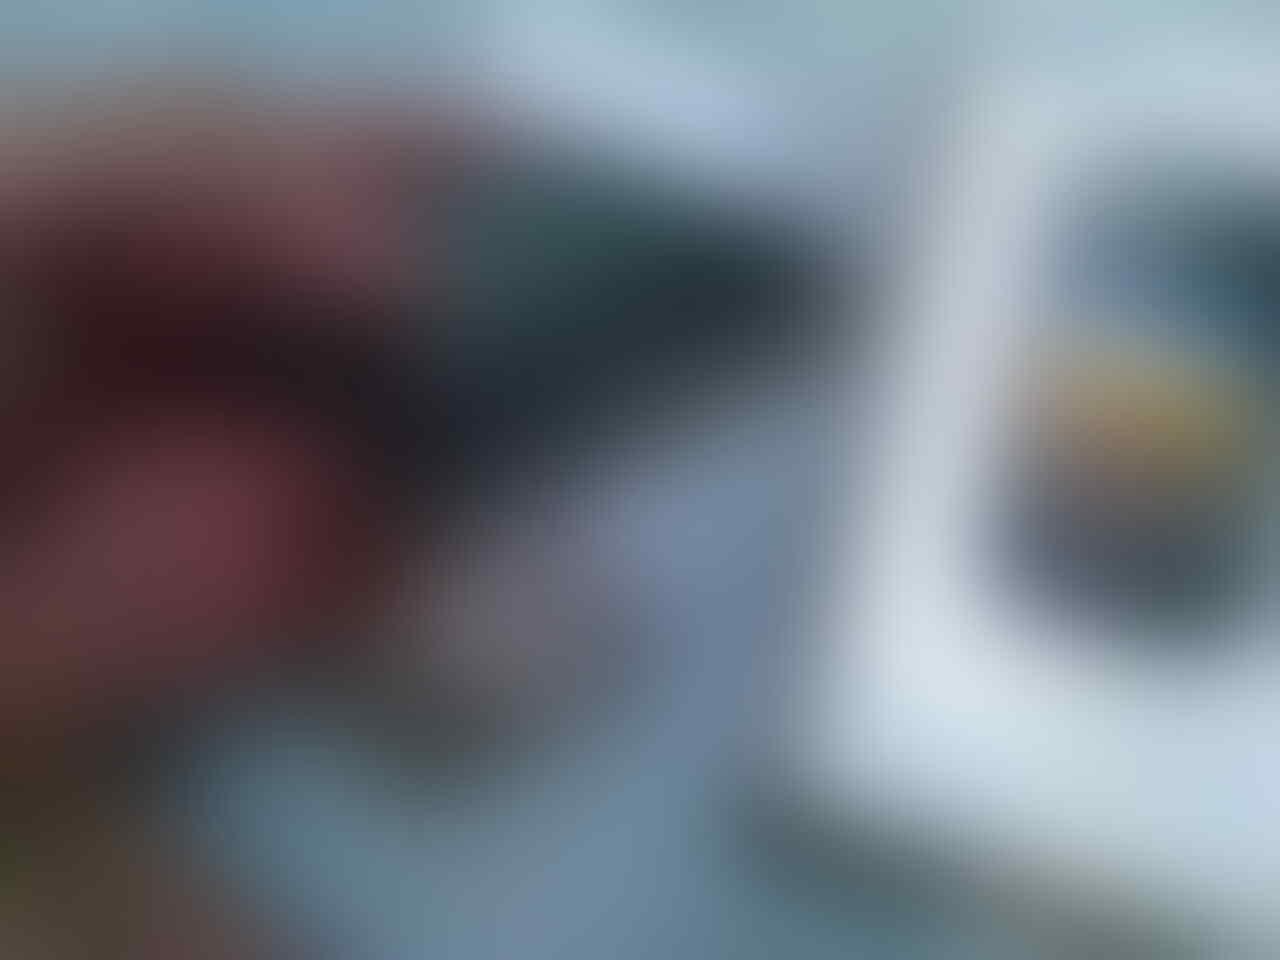 Samsung Galaxy Young 1 komplit mint condition masuk aja dulu